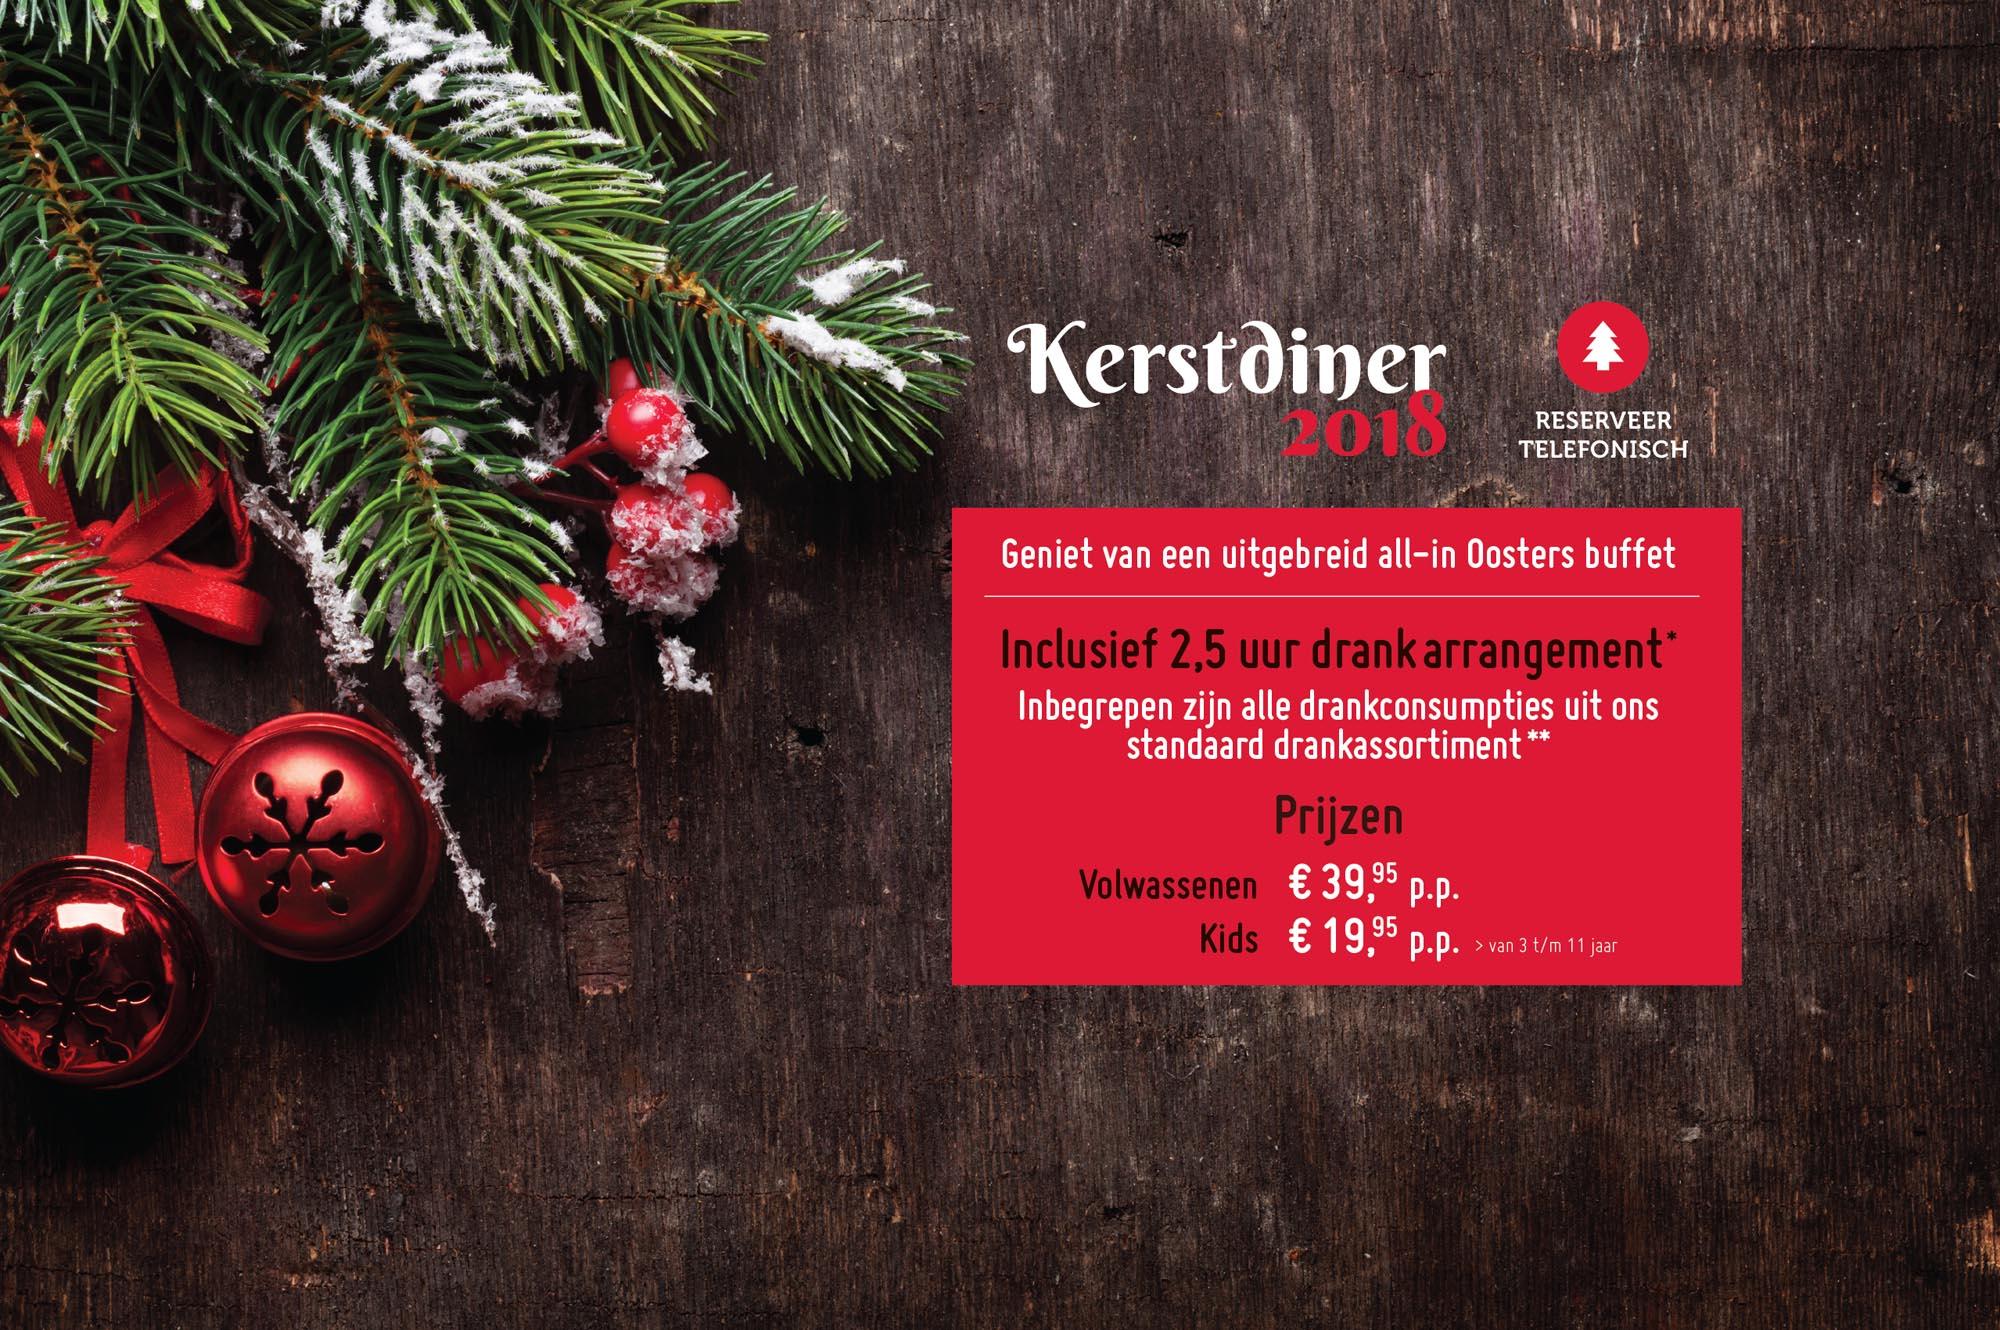 Kerstmenu 2018 Breda